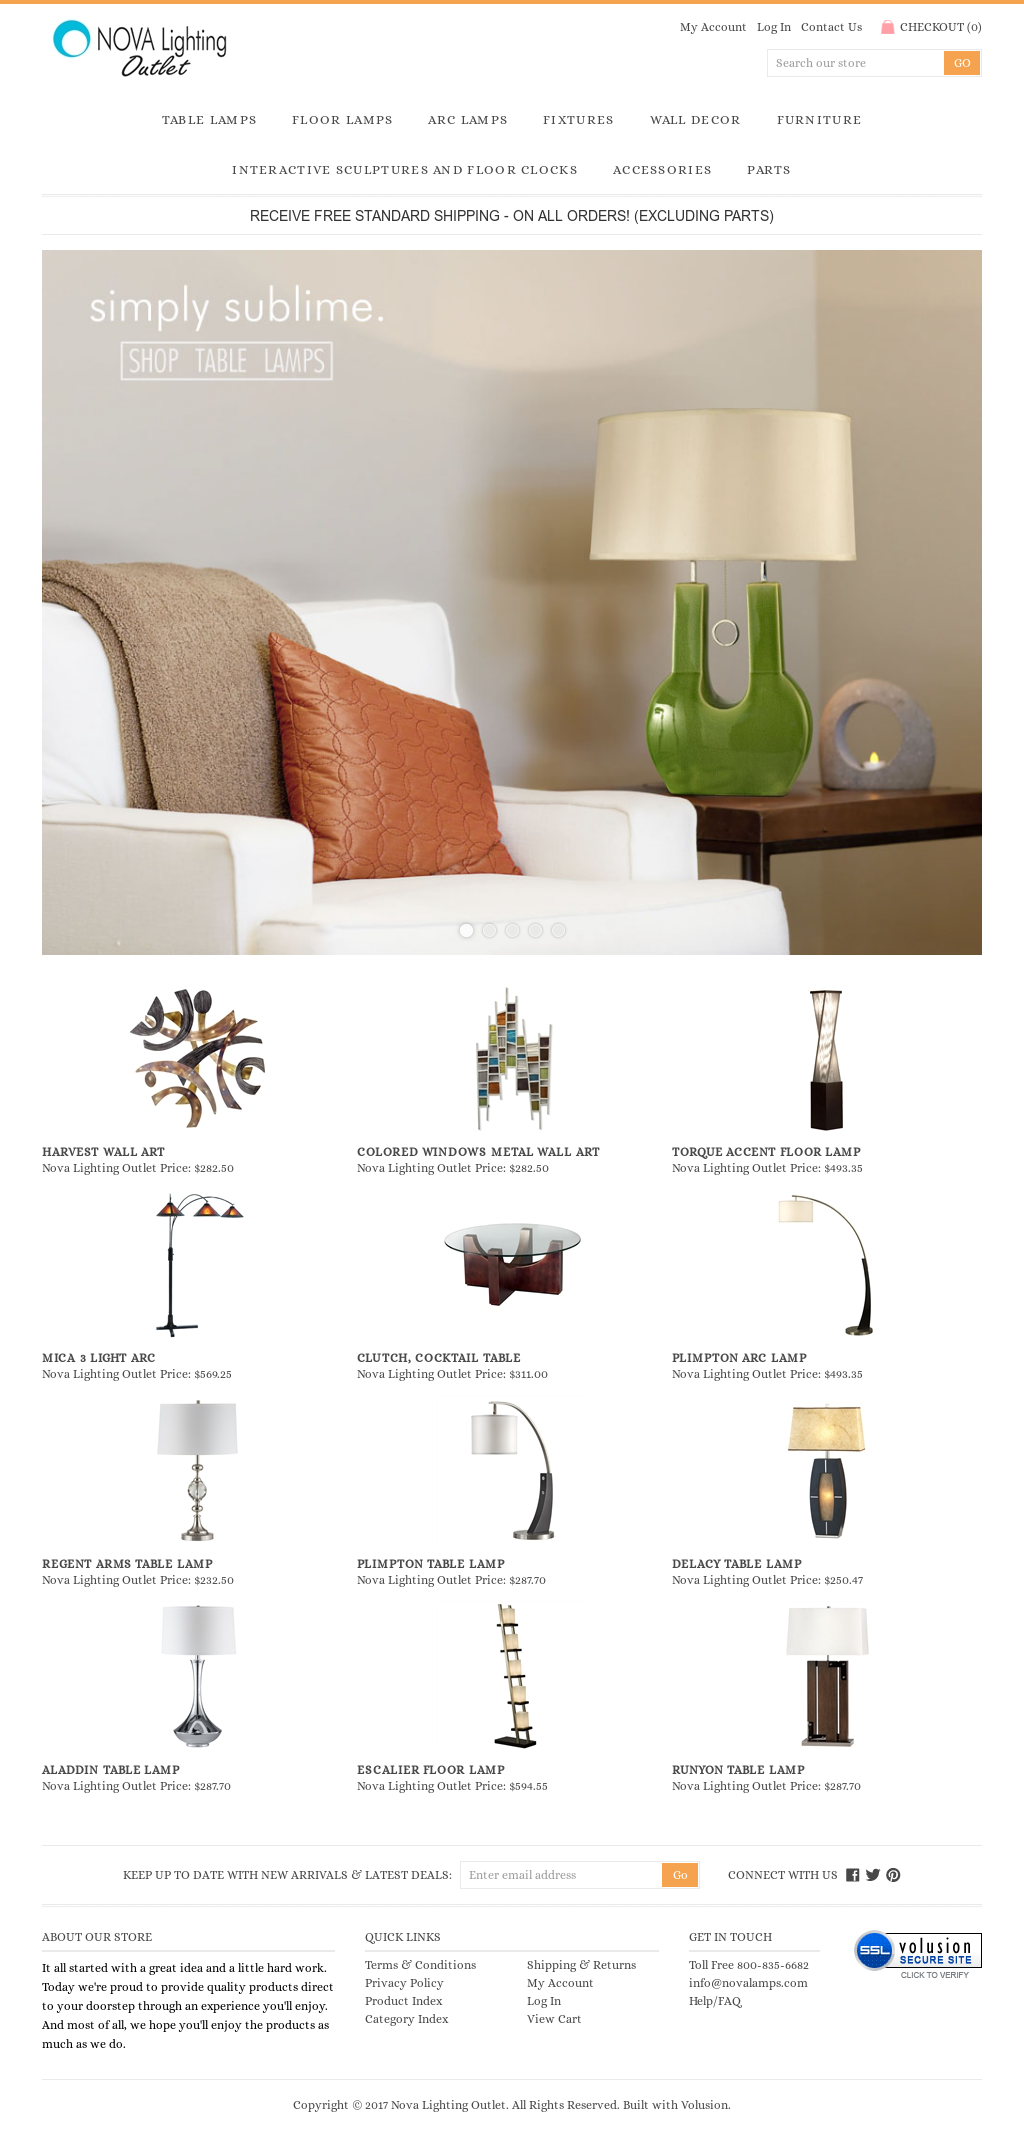 Nova Lighting Outlet Website History